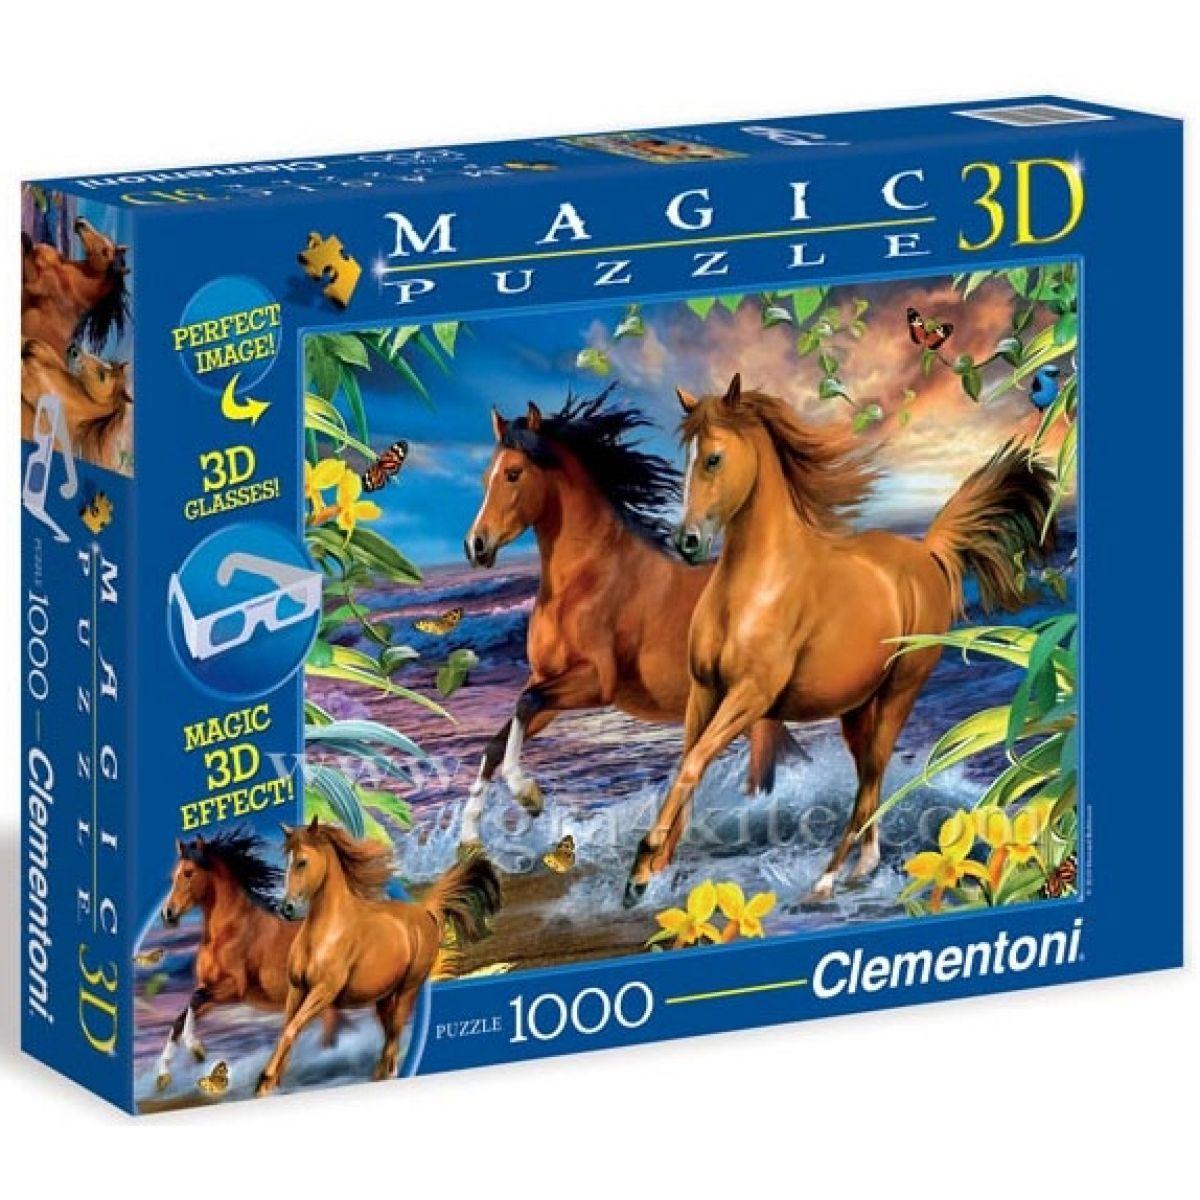 Clementoni 39222 - Puzzle Magic 3D 1000, Kůň ve vlnách